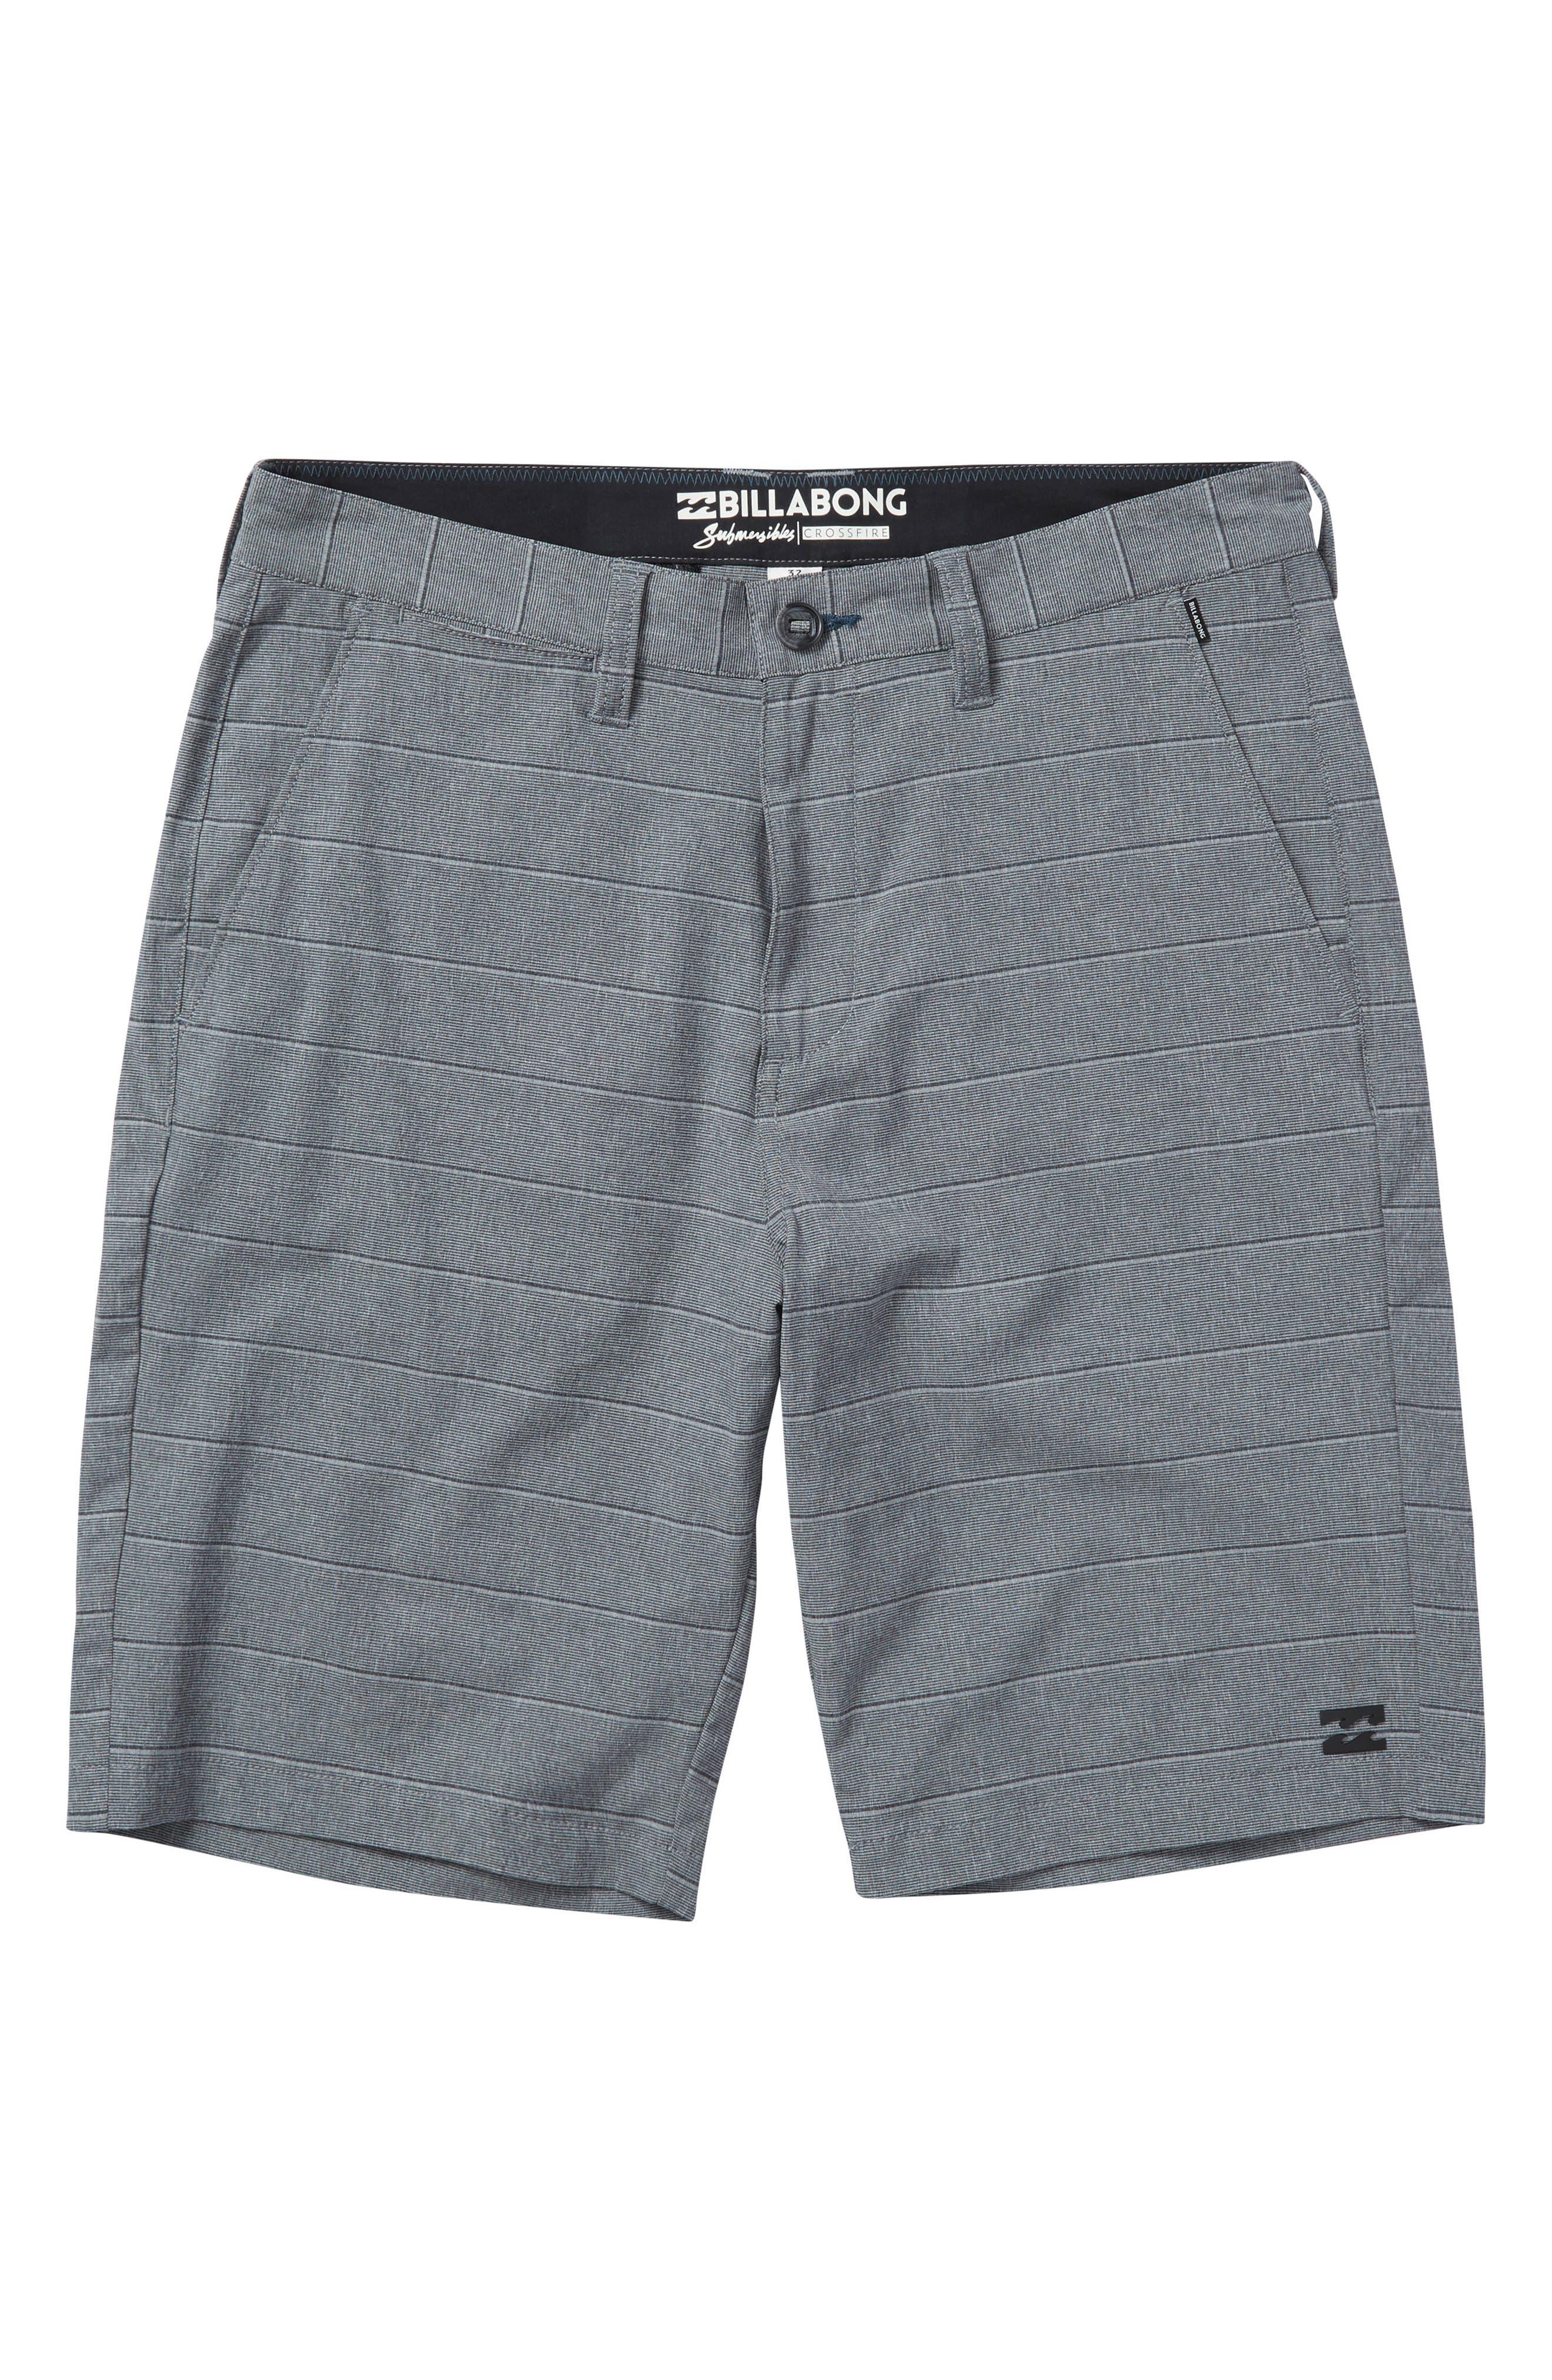 Crossfire X Stripe Hybrid Shorts,                             Main thumbnail 1, color,                             Dark Grey